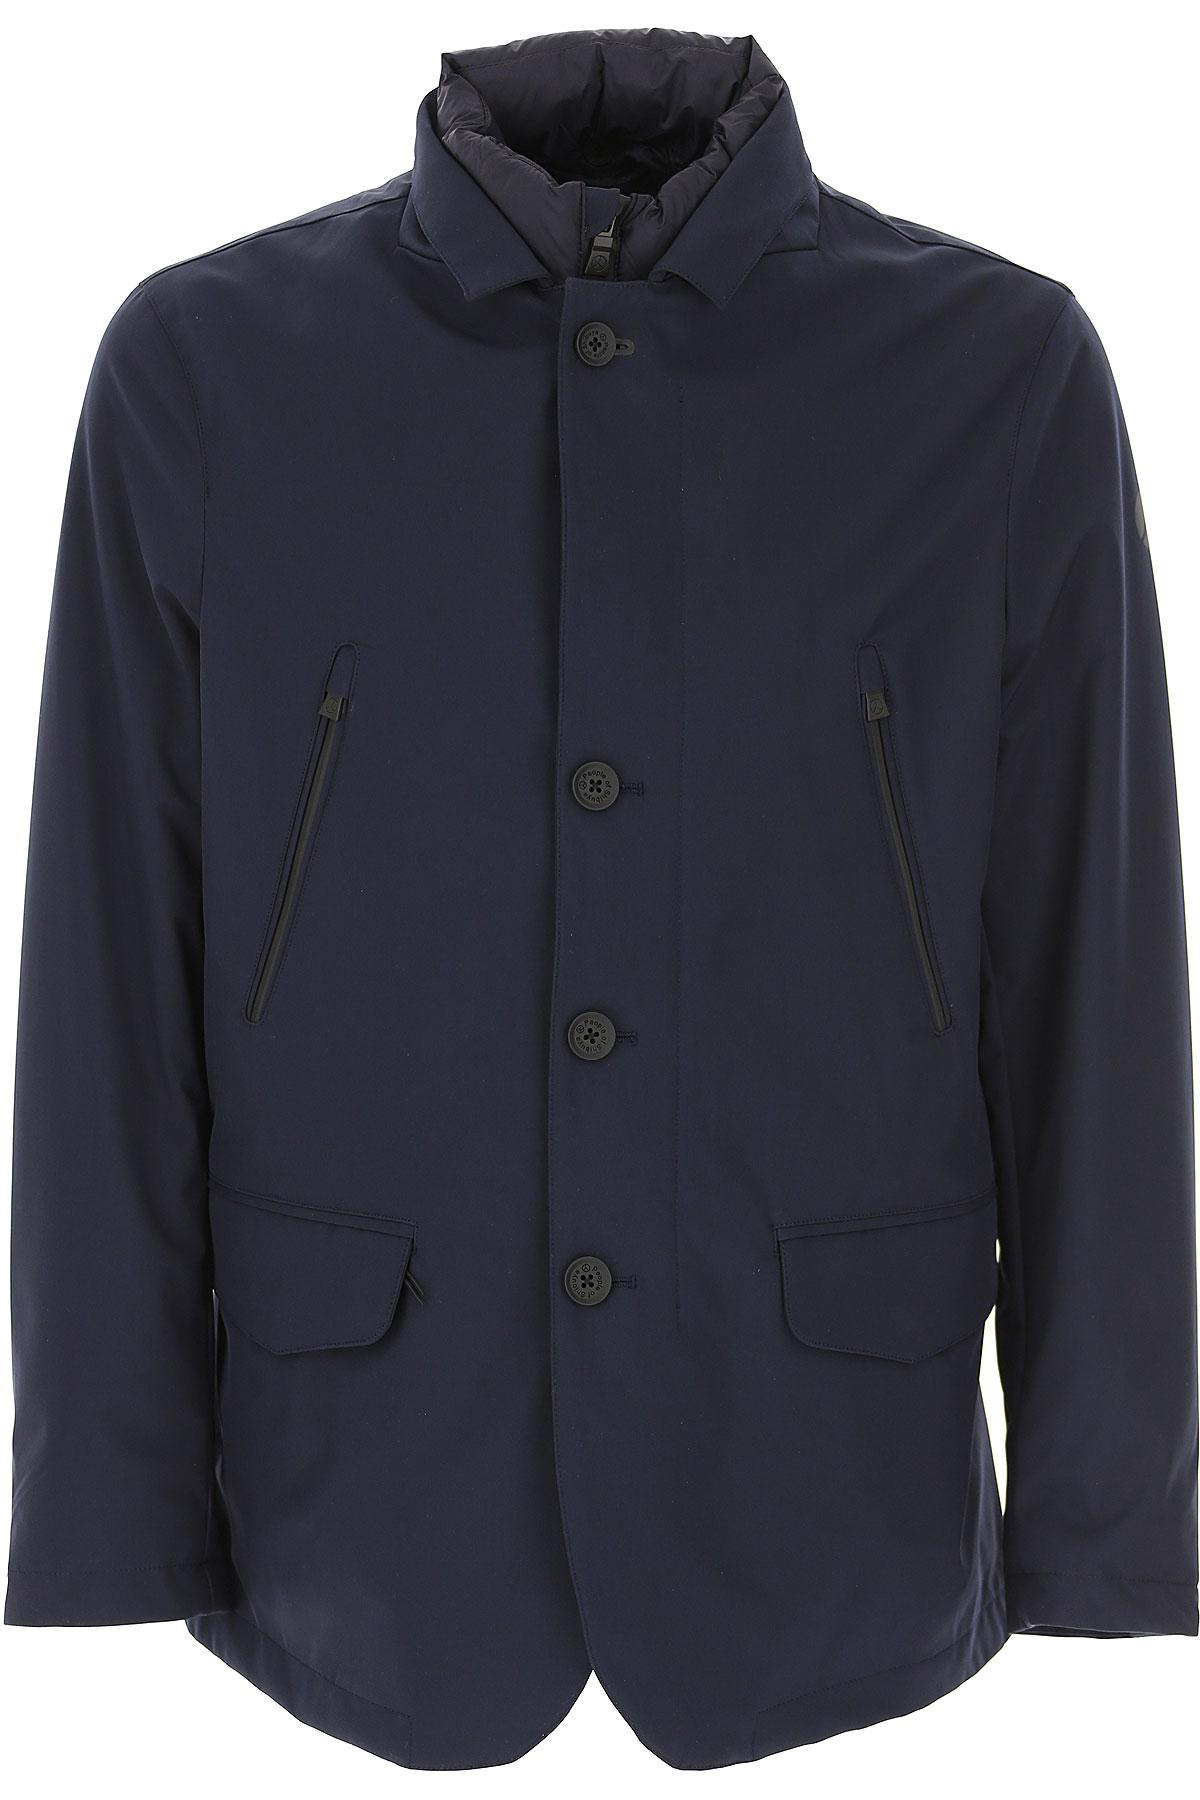 People of Shibuya Veste Homme, Bleu, Polyester, 2019, L XL